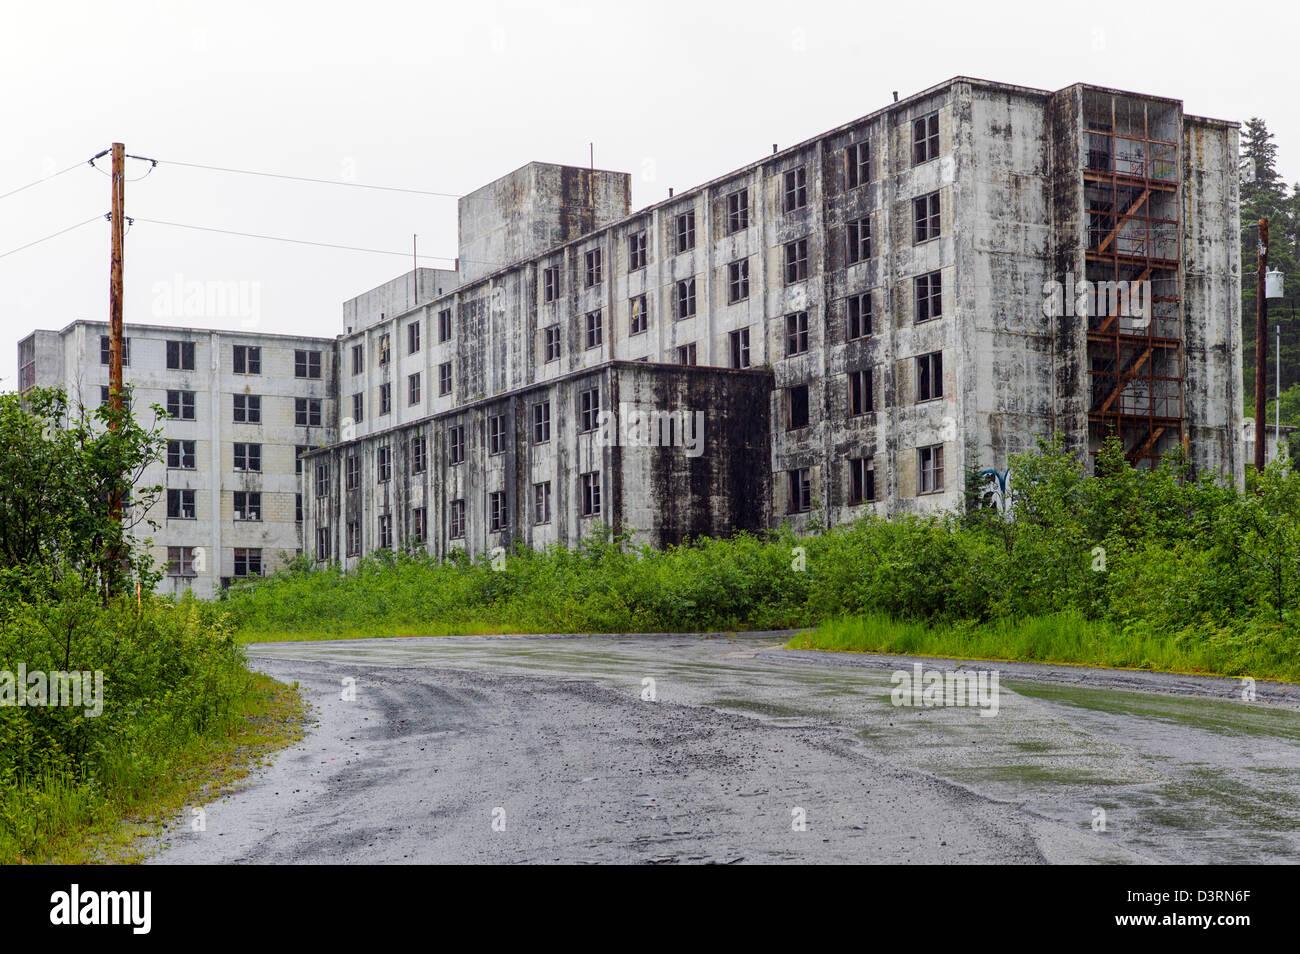 Historic Buckner Building, once the largest building in Alaska, Whittier, Alaska, USA.  Now abandoned, full of asbestos. - Stock Image